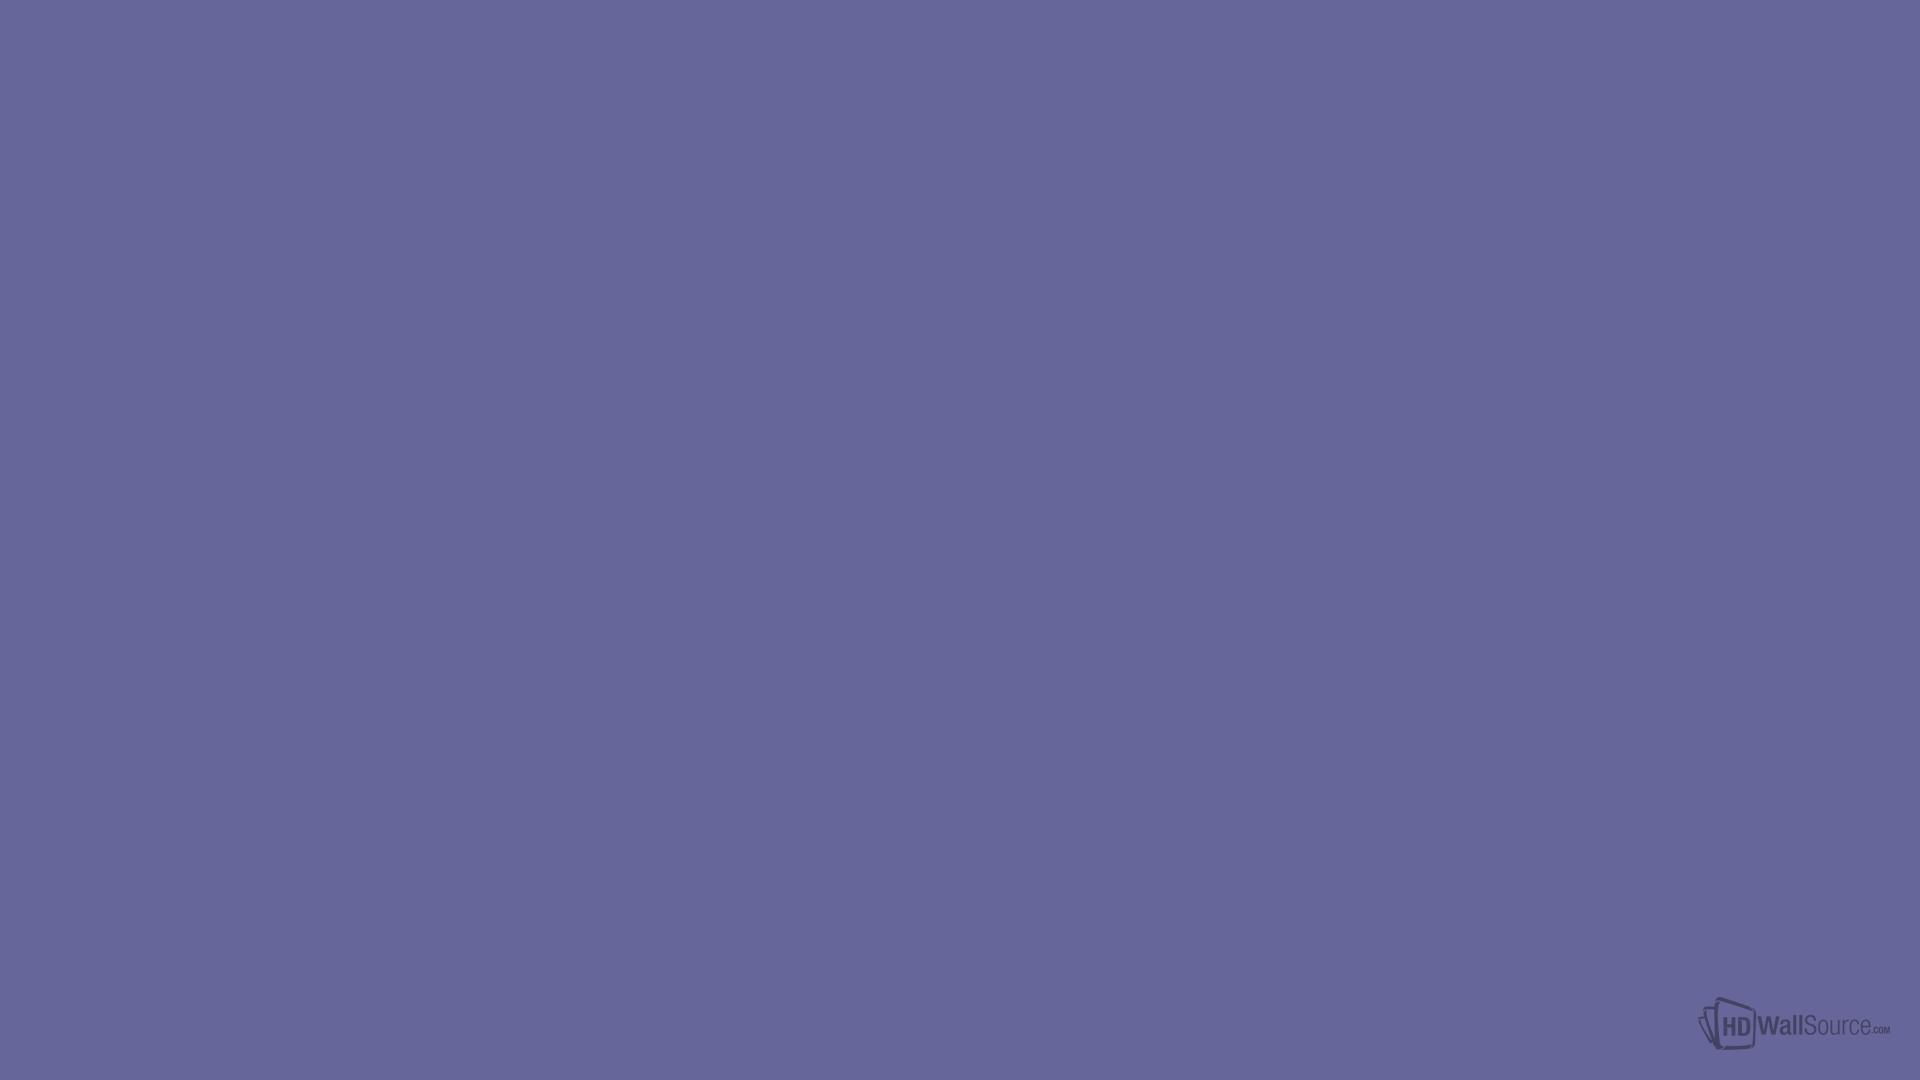 666699 wallpaper 71060